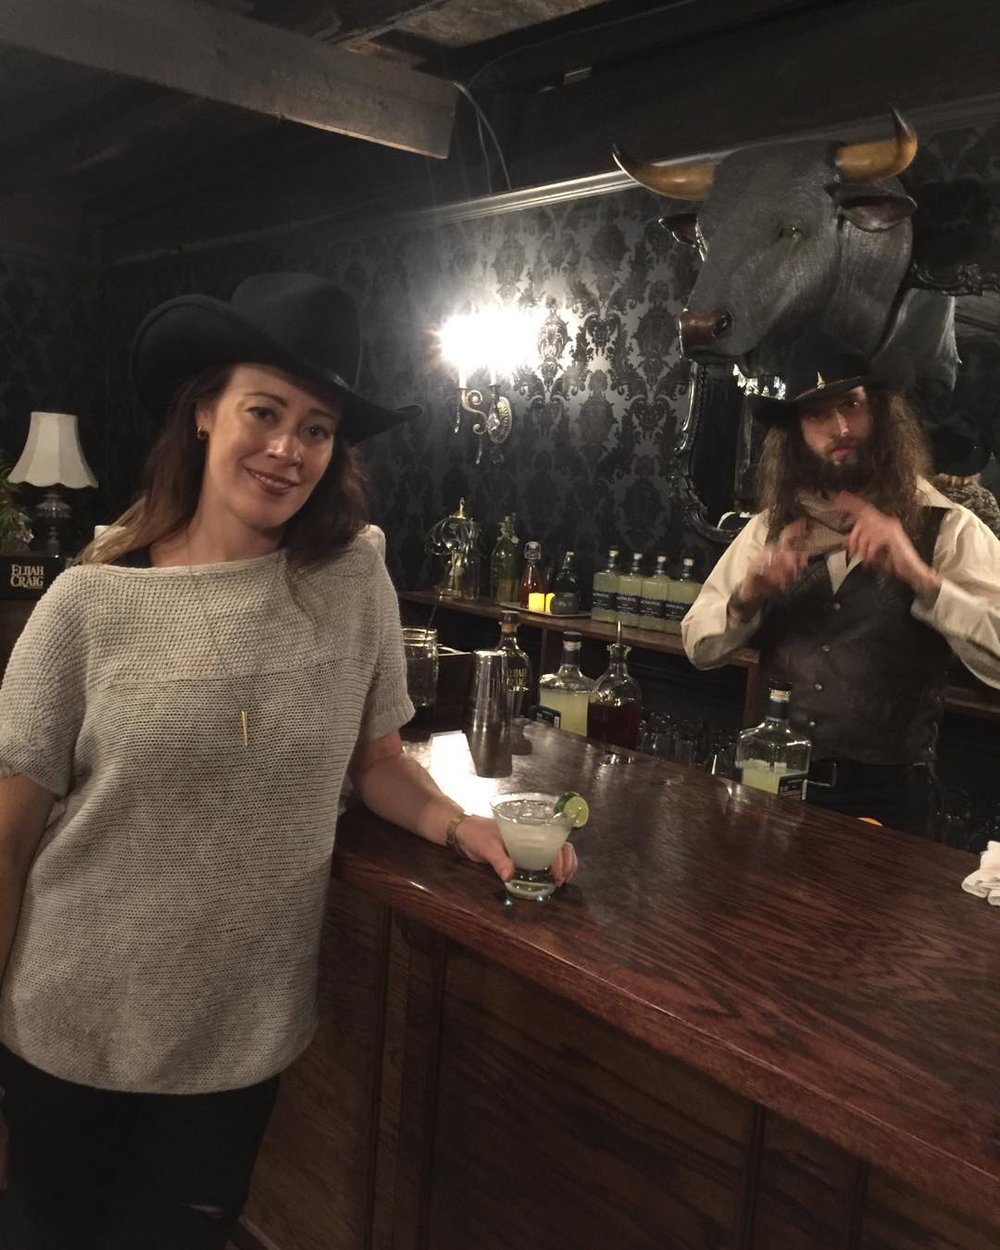 austin_bartender_Drink_slingers_westworld_Aryn_Coronado.jpg